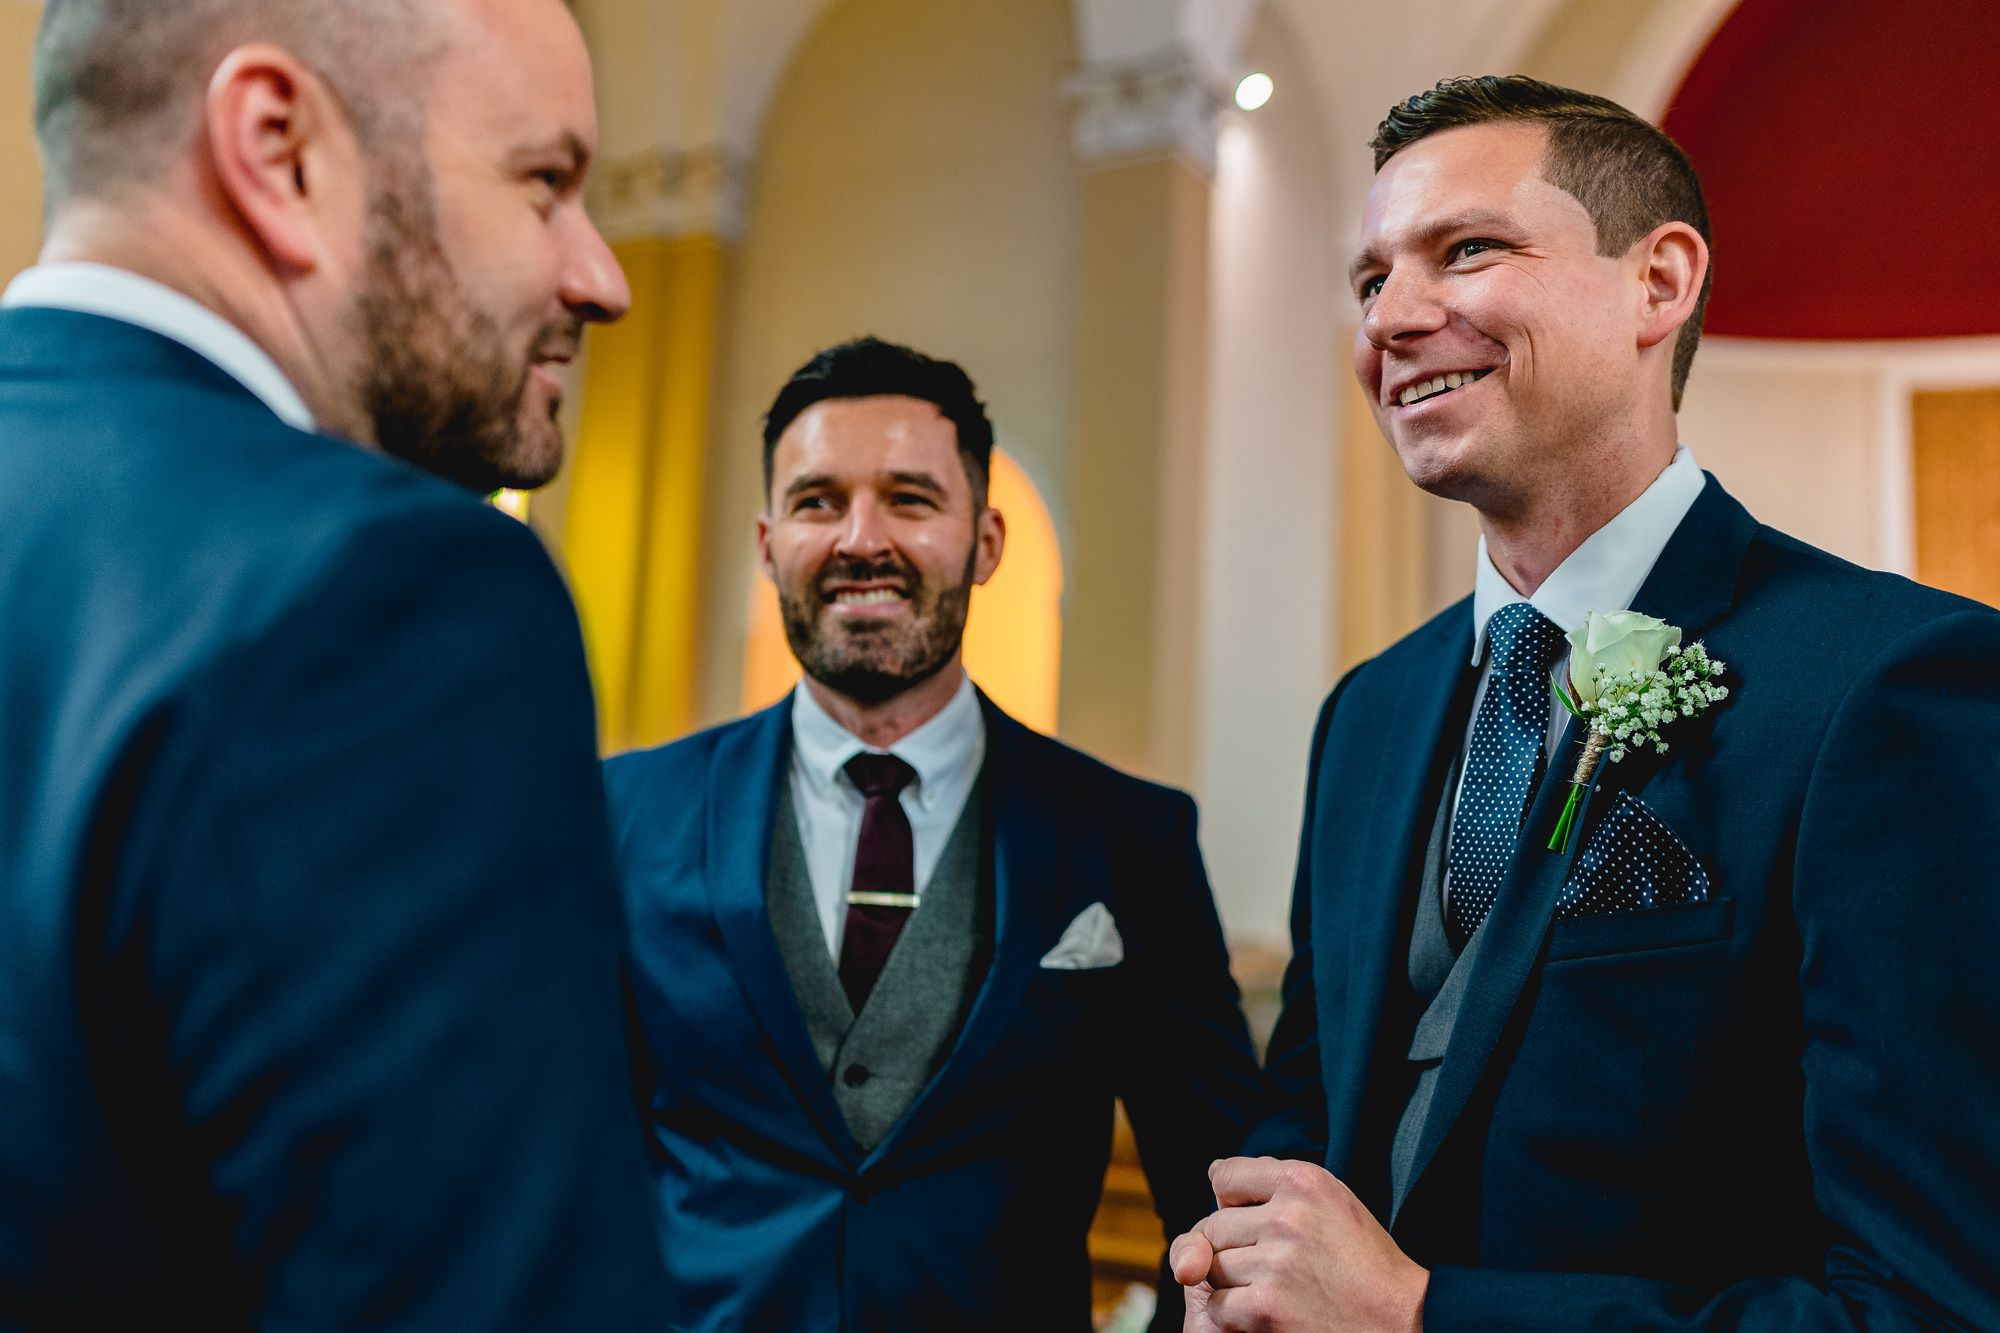 The-Castlefield-Rooms-Wedding-Photographer_0004.jpg